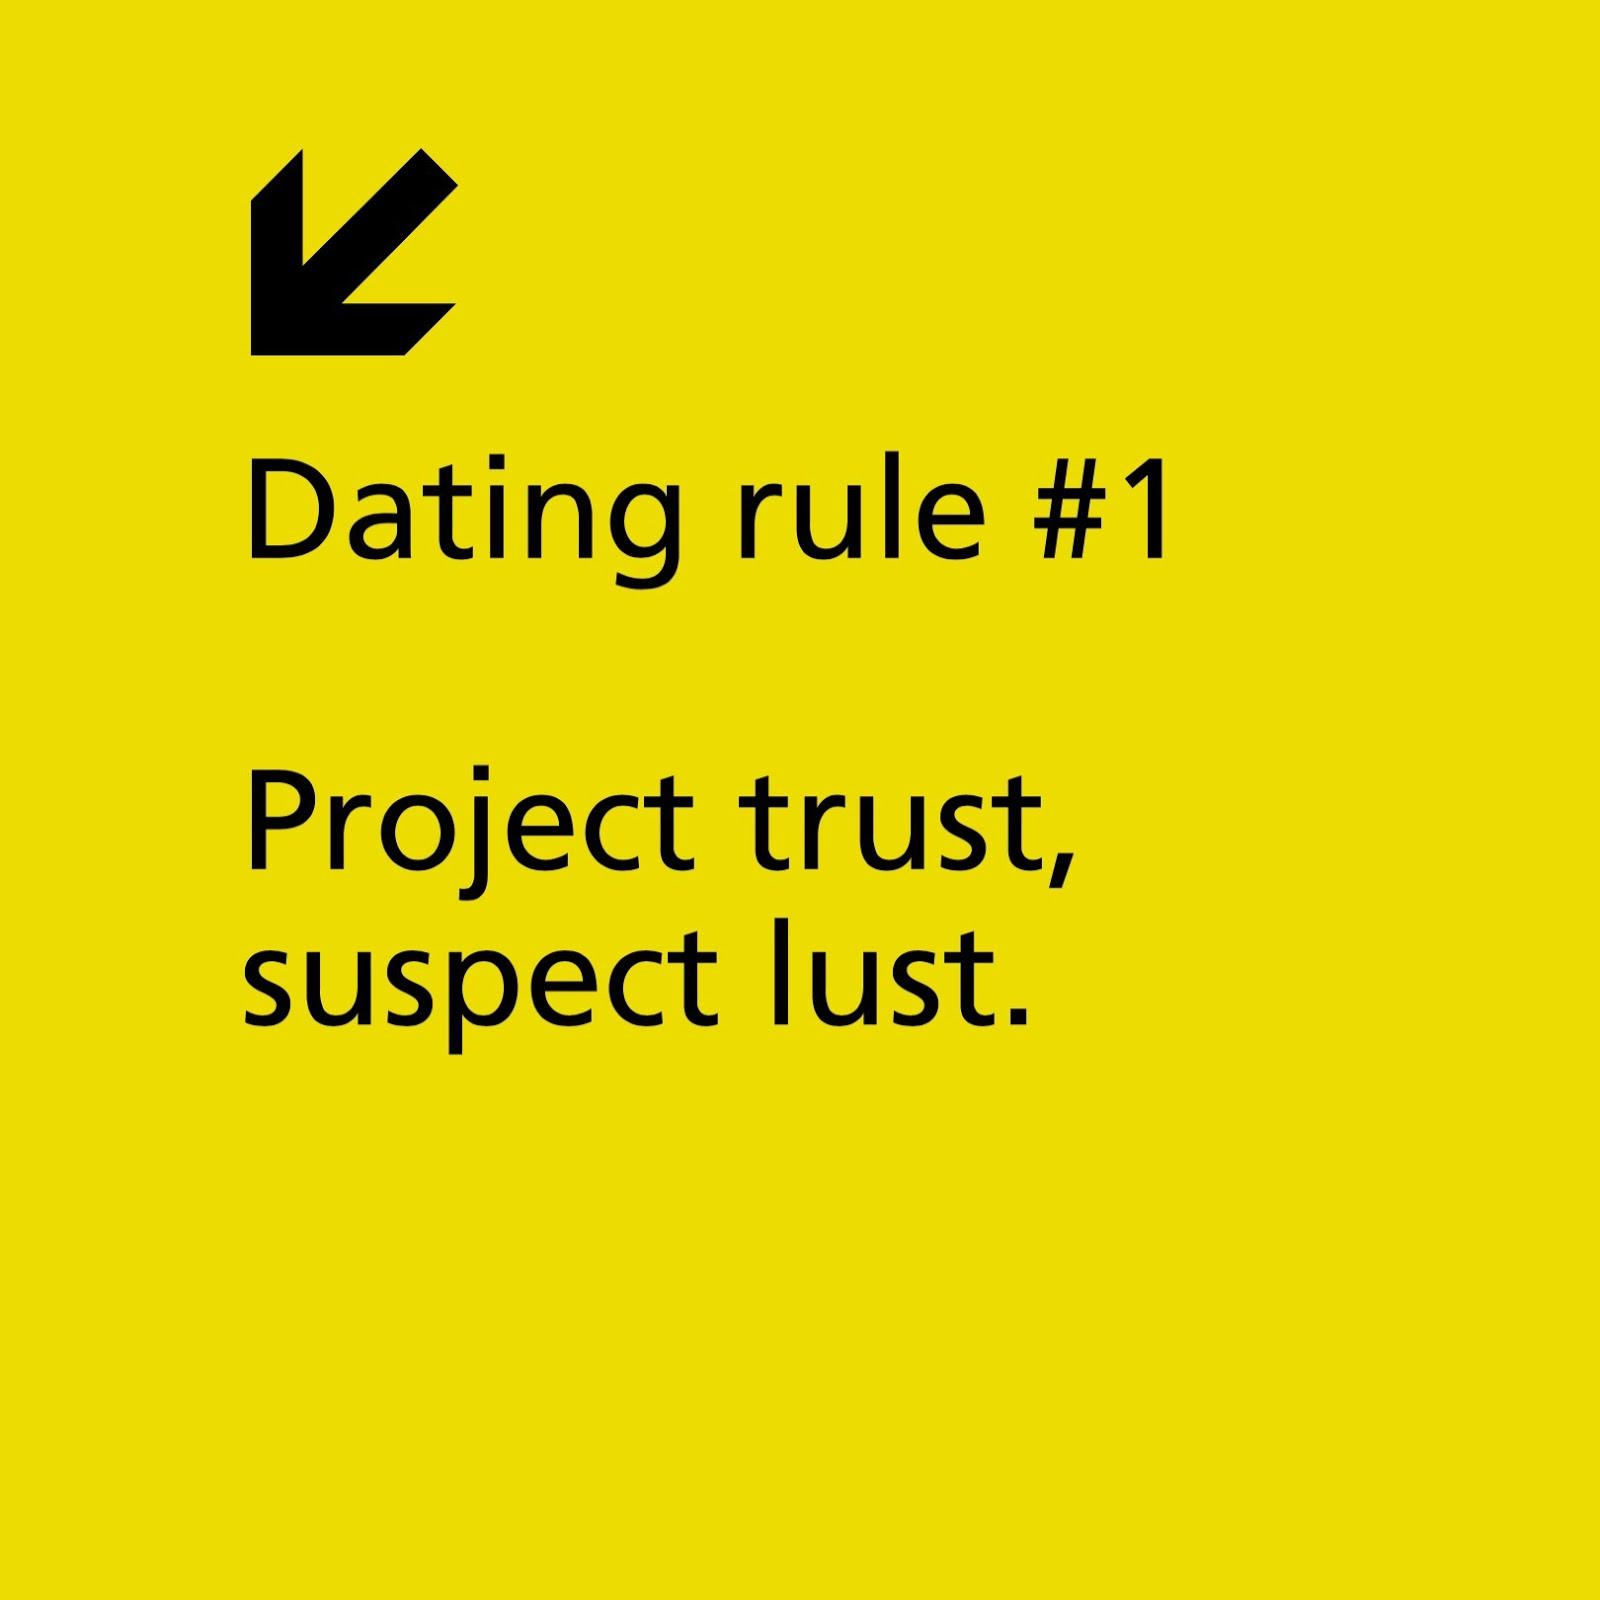 dating wednesday rule